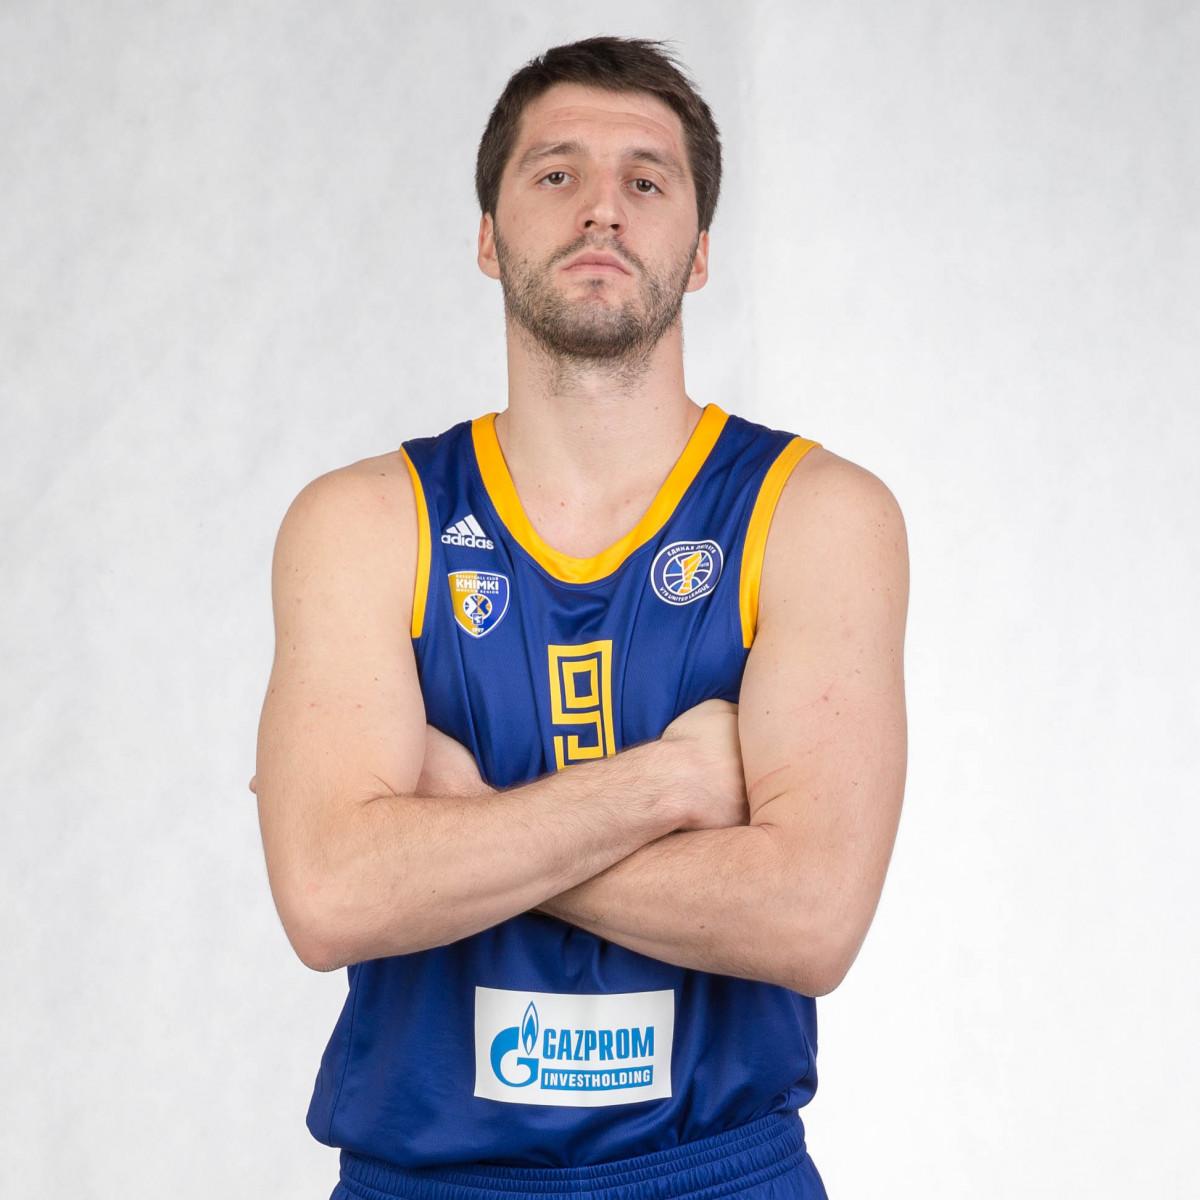 Photo of Stefan Markovic, 2018-2019 season